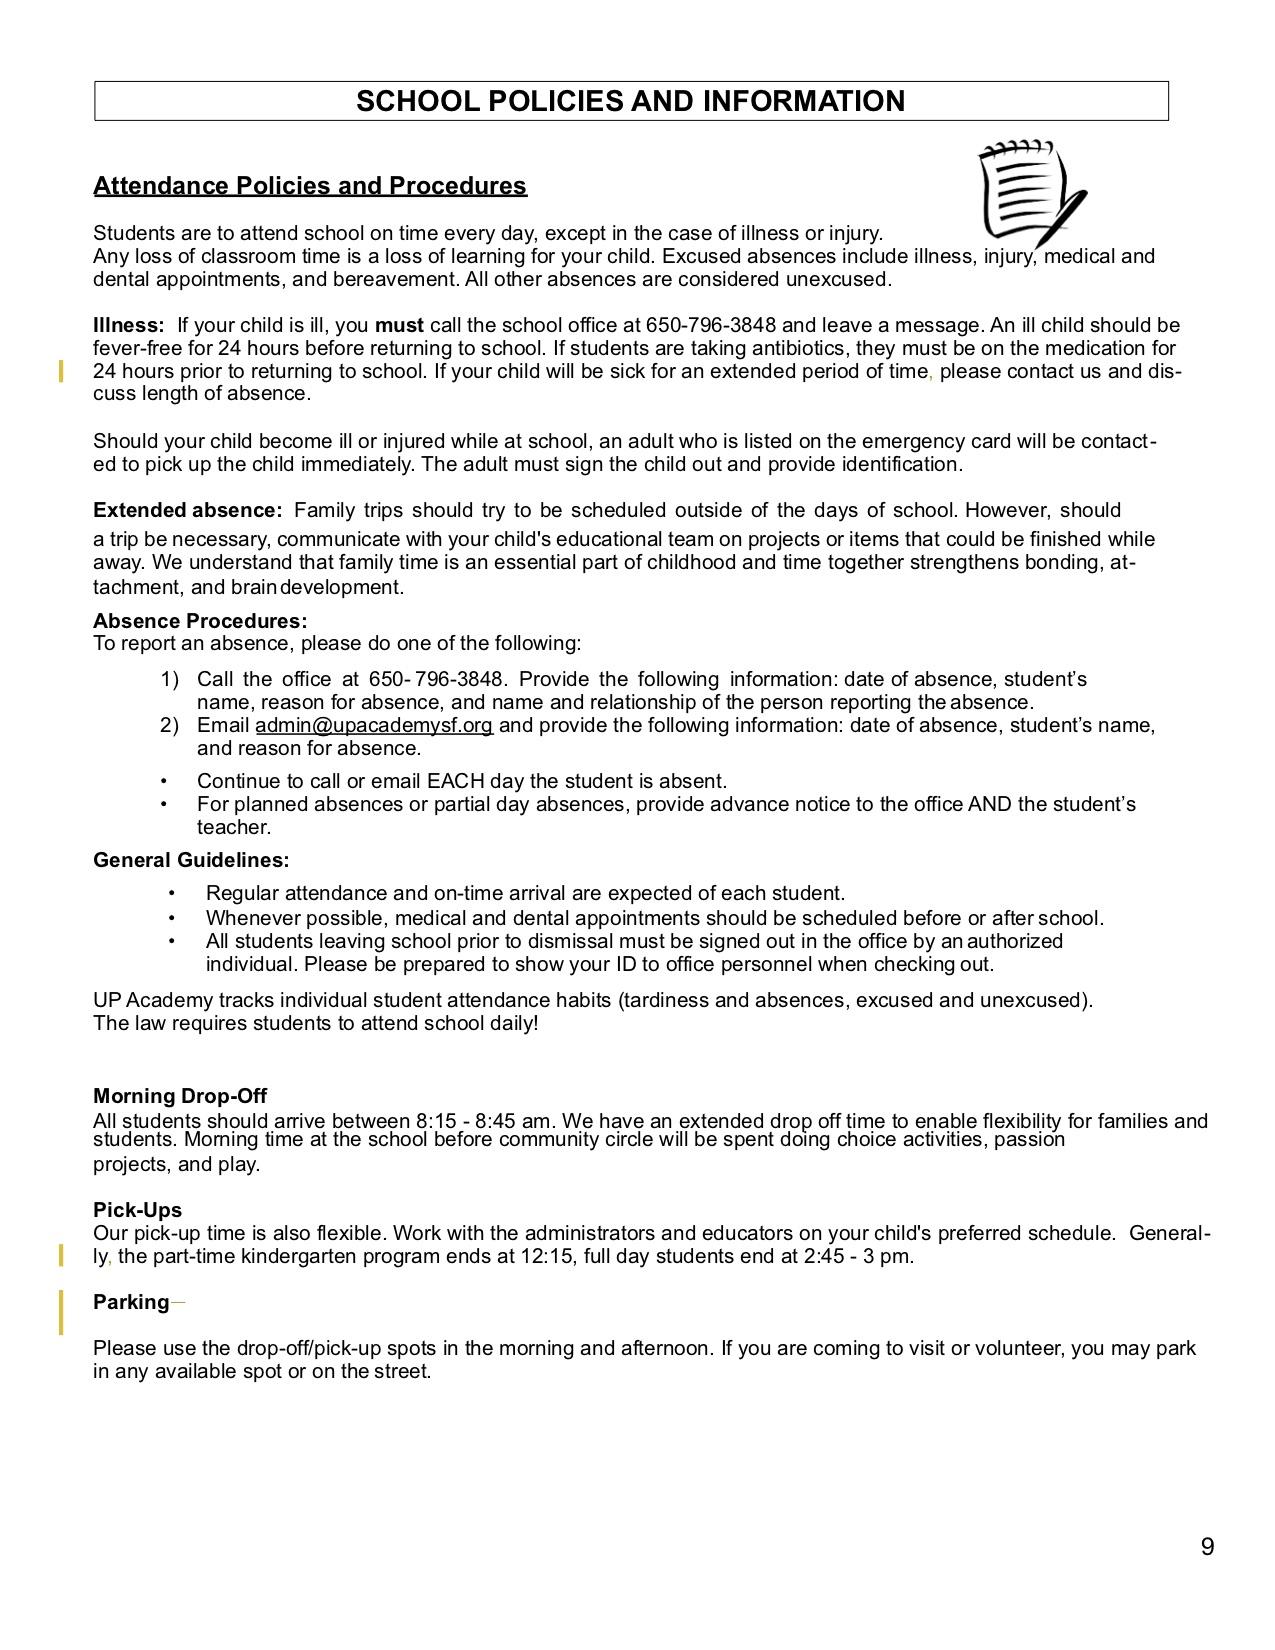 18-19 Parent and Student Handbook V4-8.jpg